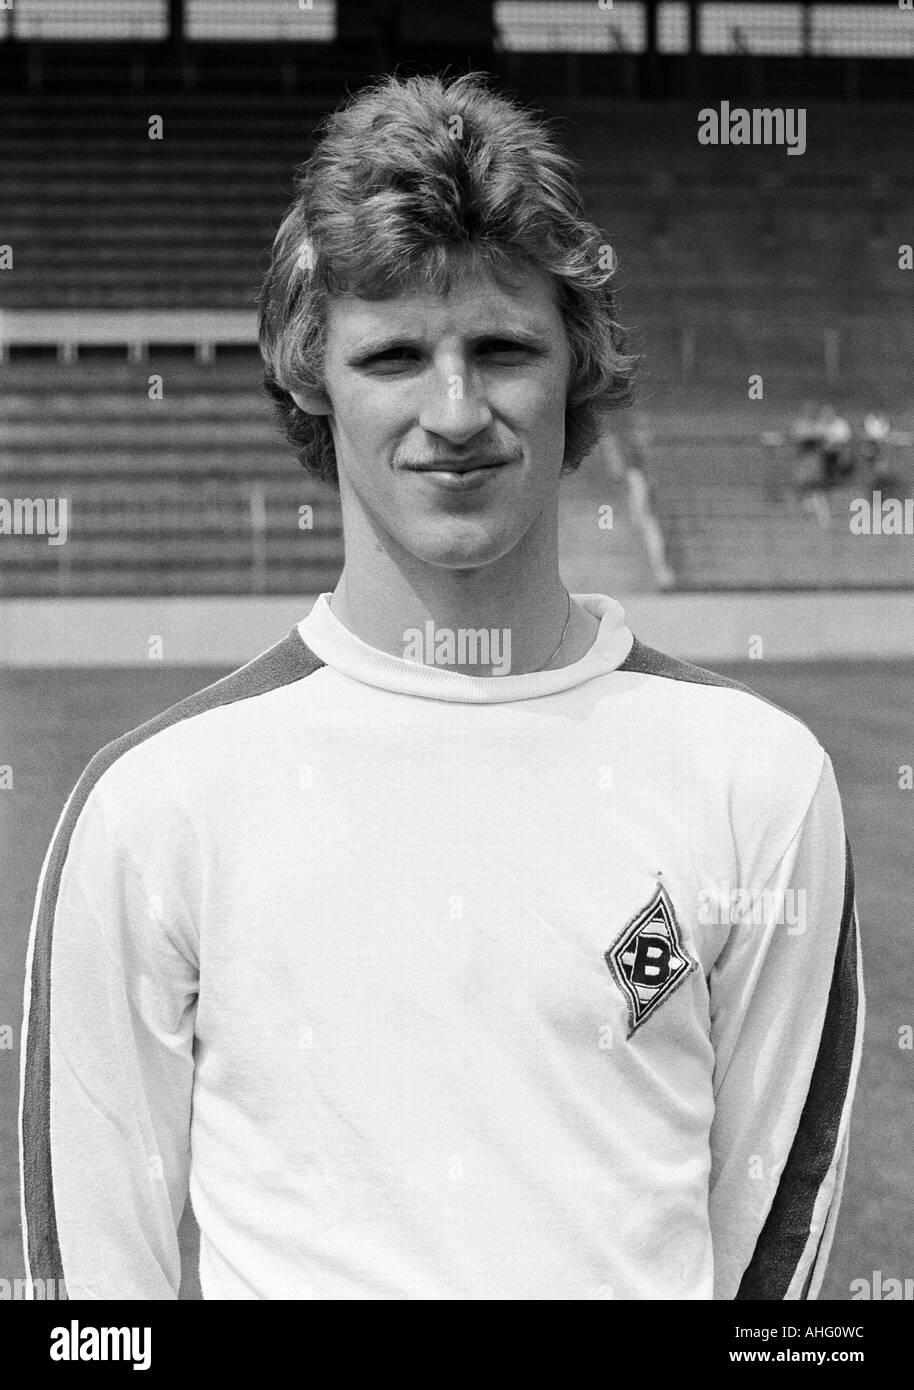 football, Bundesliga, Borussia Moenchengladbach, presentation of the team for the new saison 1975/1976, press photo shooting, portrait of Hans Juergen Offermanns - Stock Image